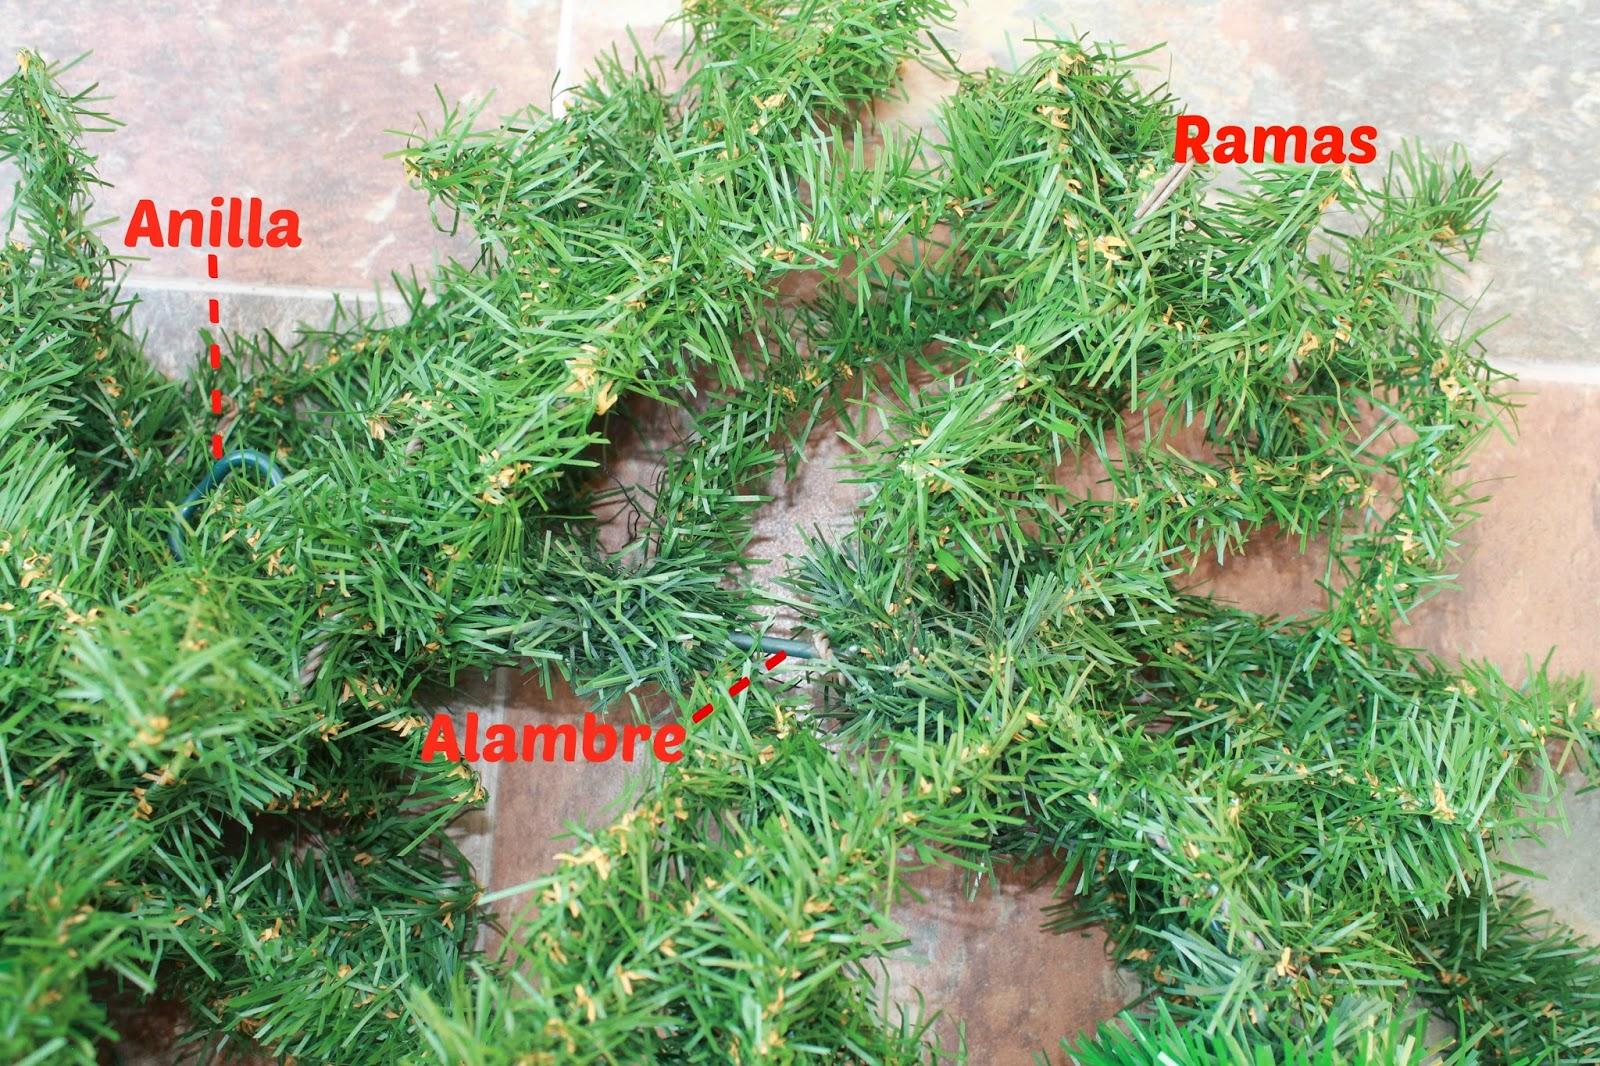 O obradoiro de klor reciclar un rbol de navidad artificial - Arbol artificial de navidad ...